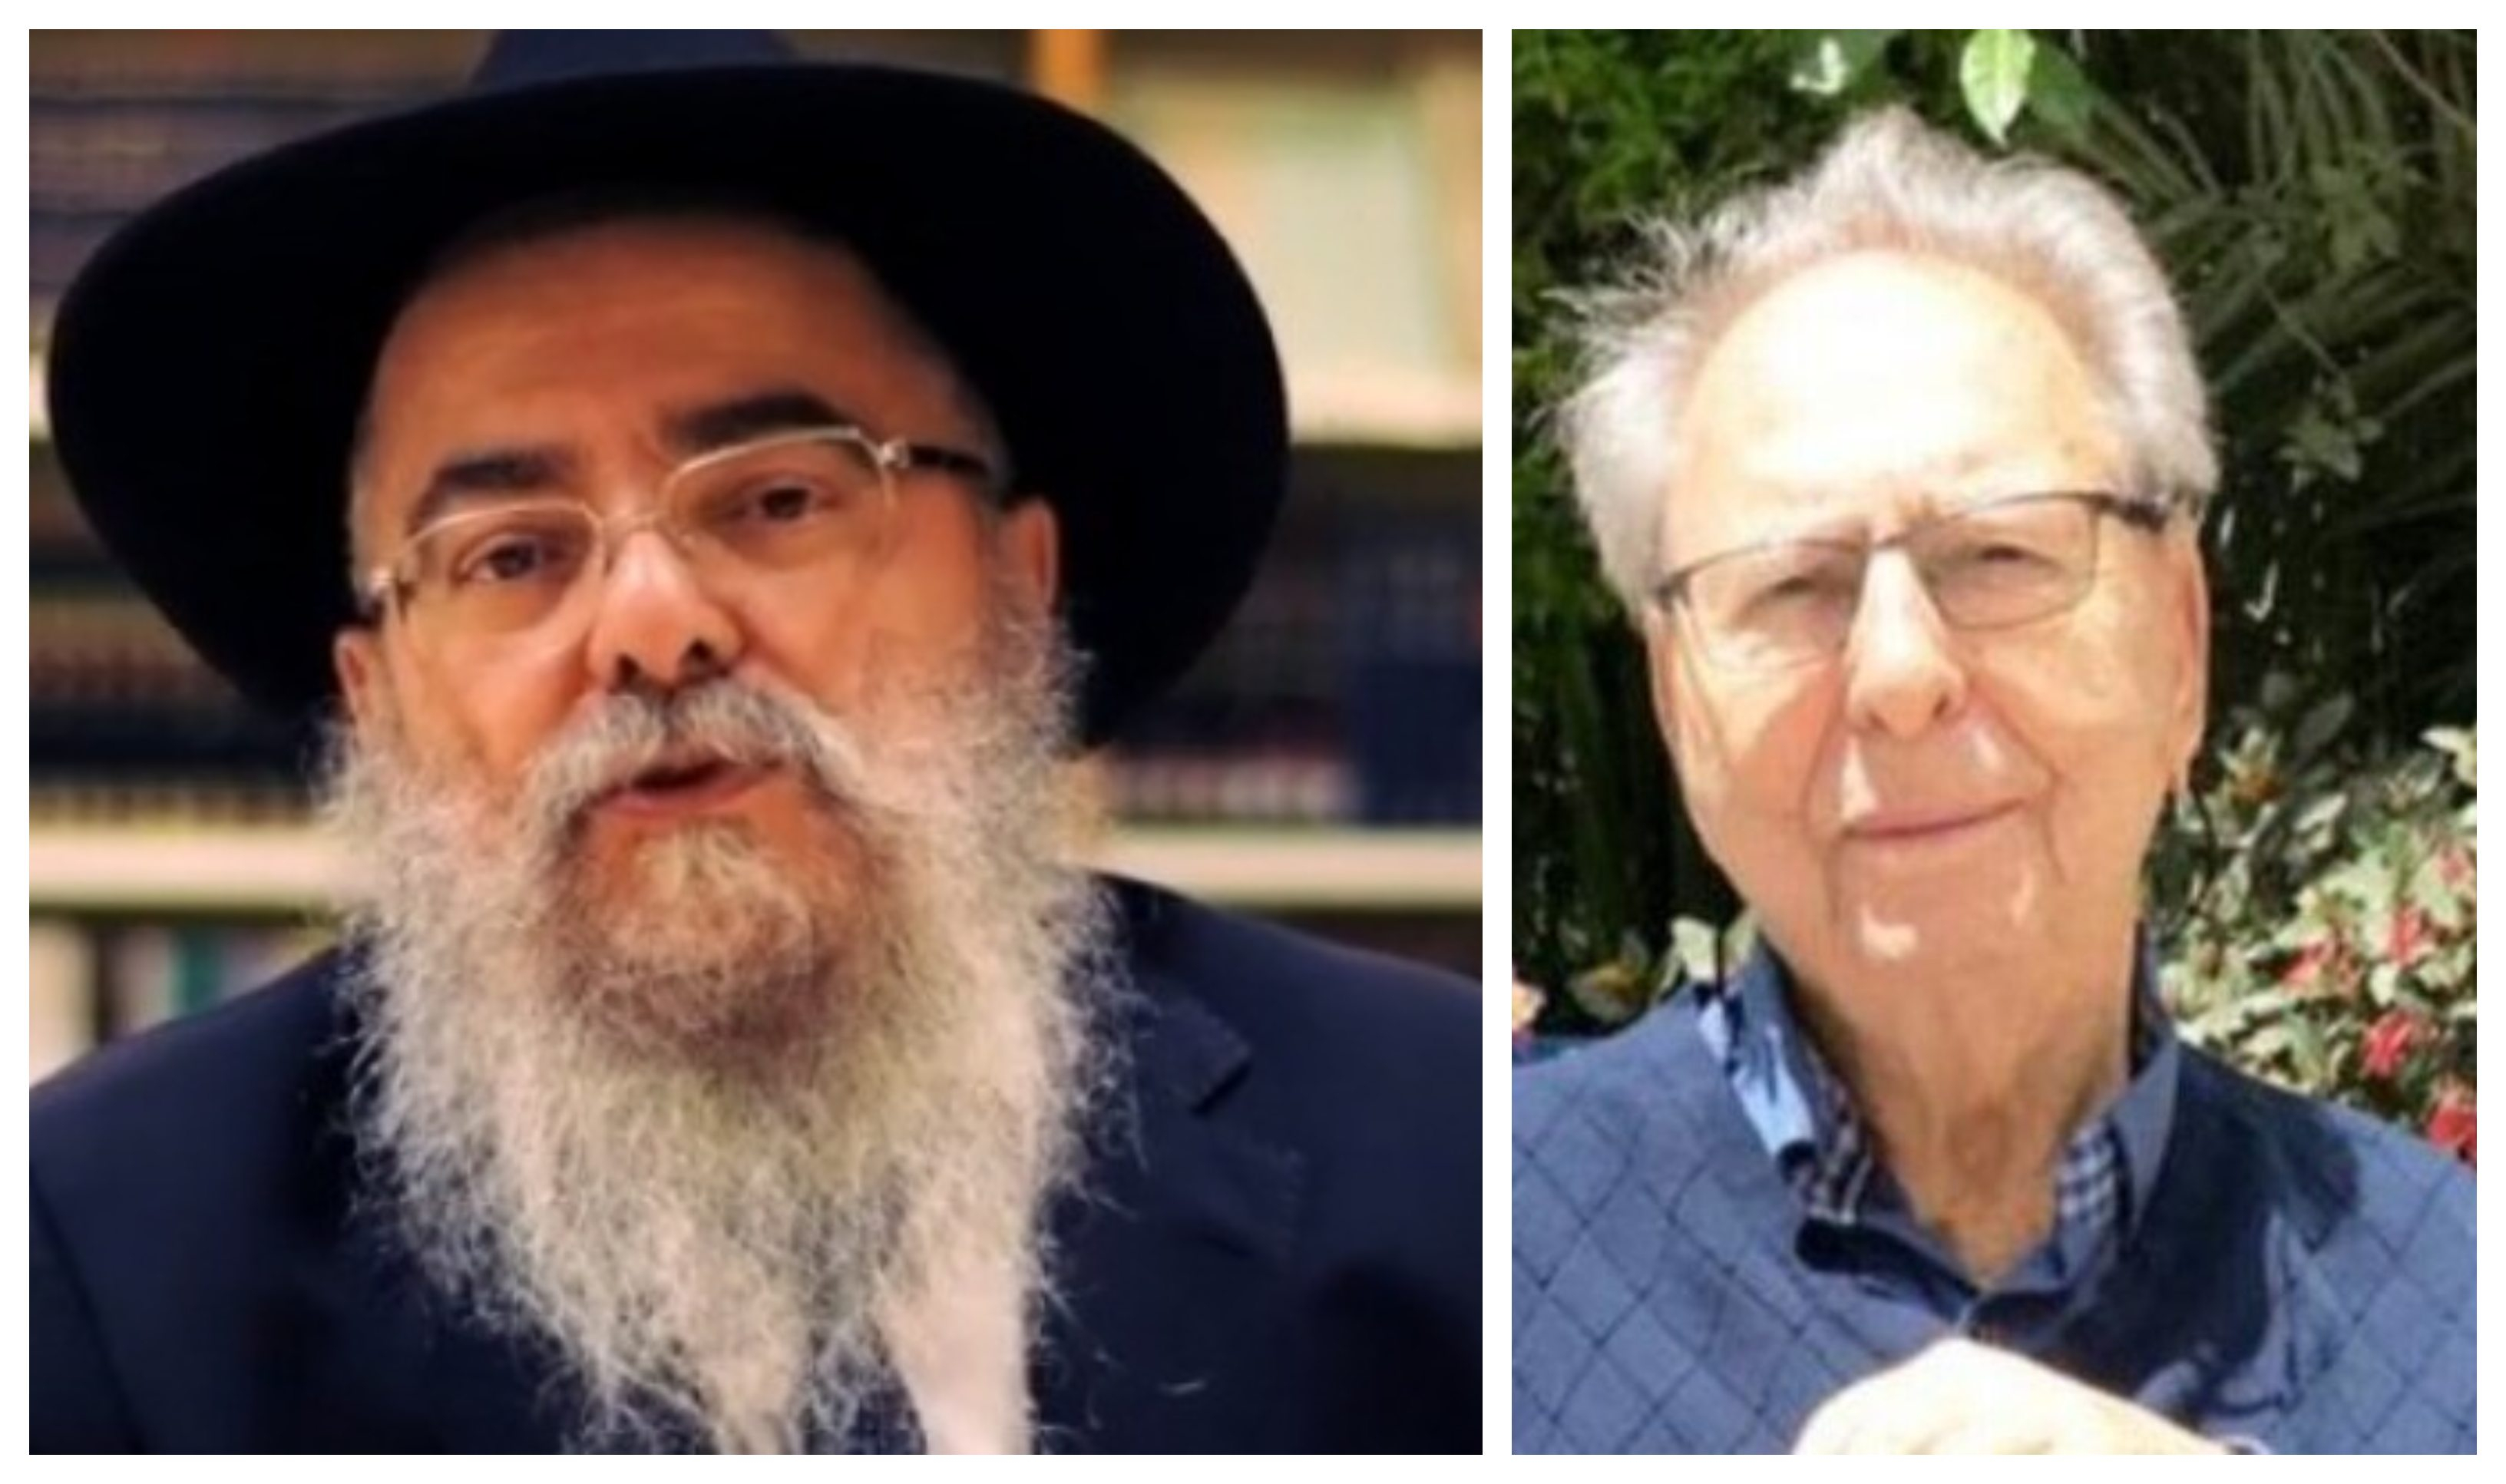 Rabbi Masud Tubul and Aryeh Even, early Jewish victims of the novel coronavirus